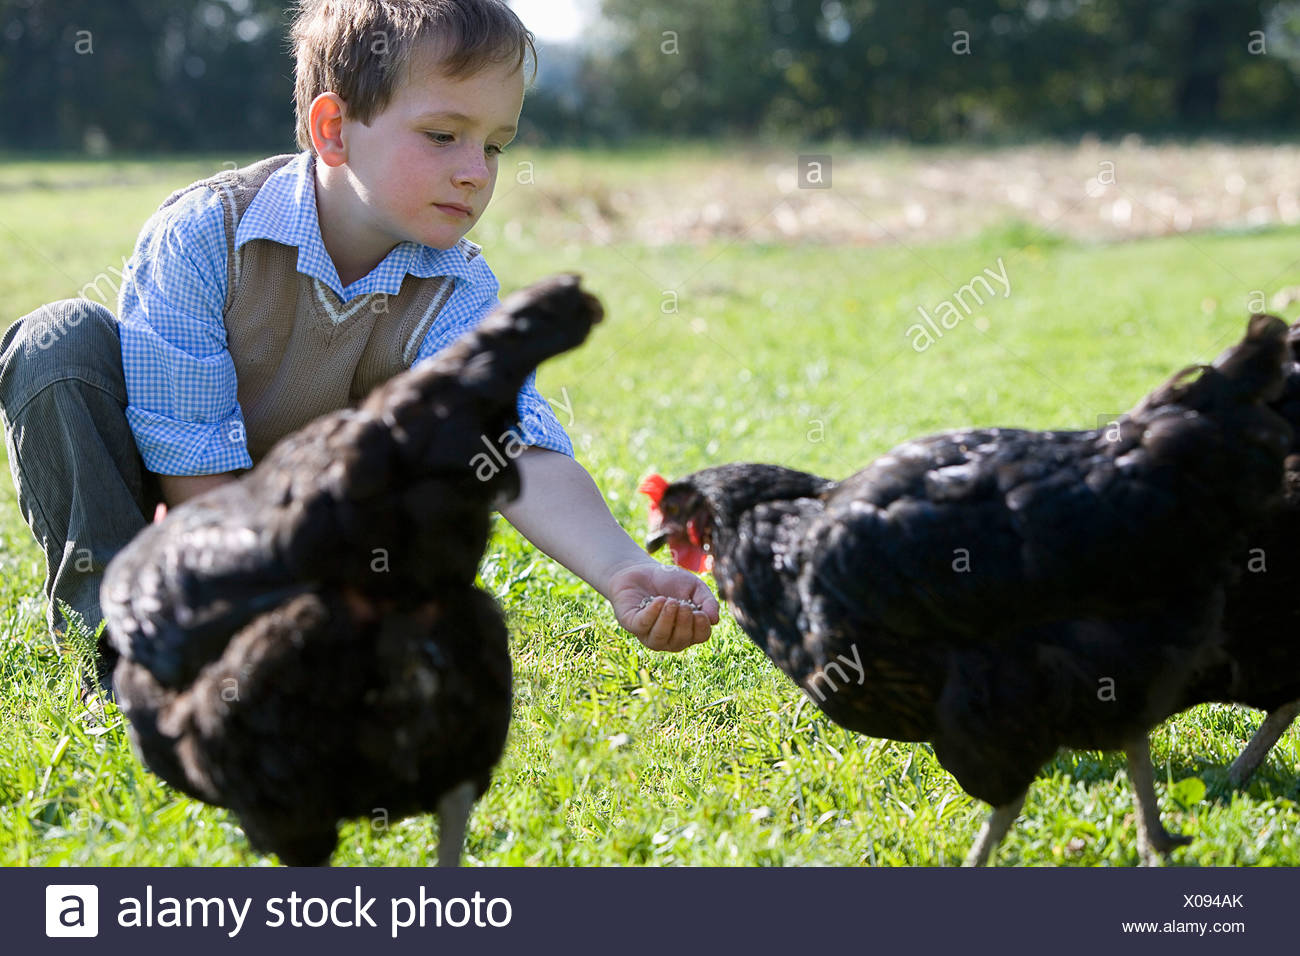 young boy feeding chicken - Stock Image